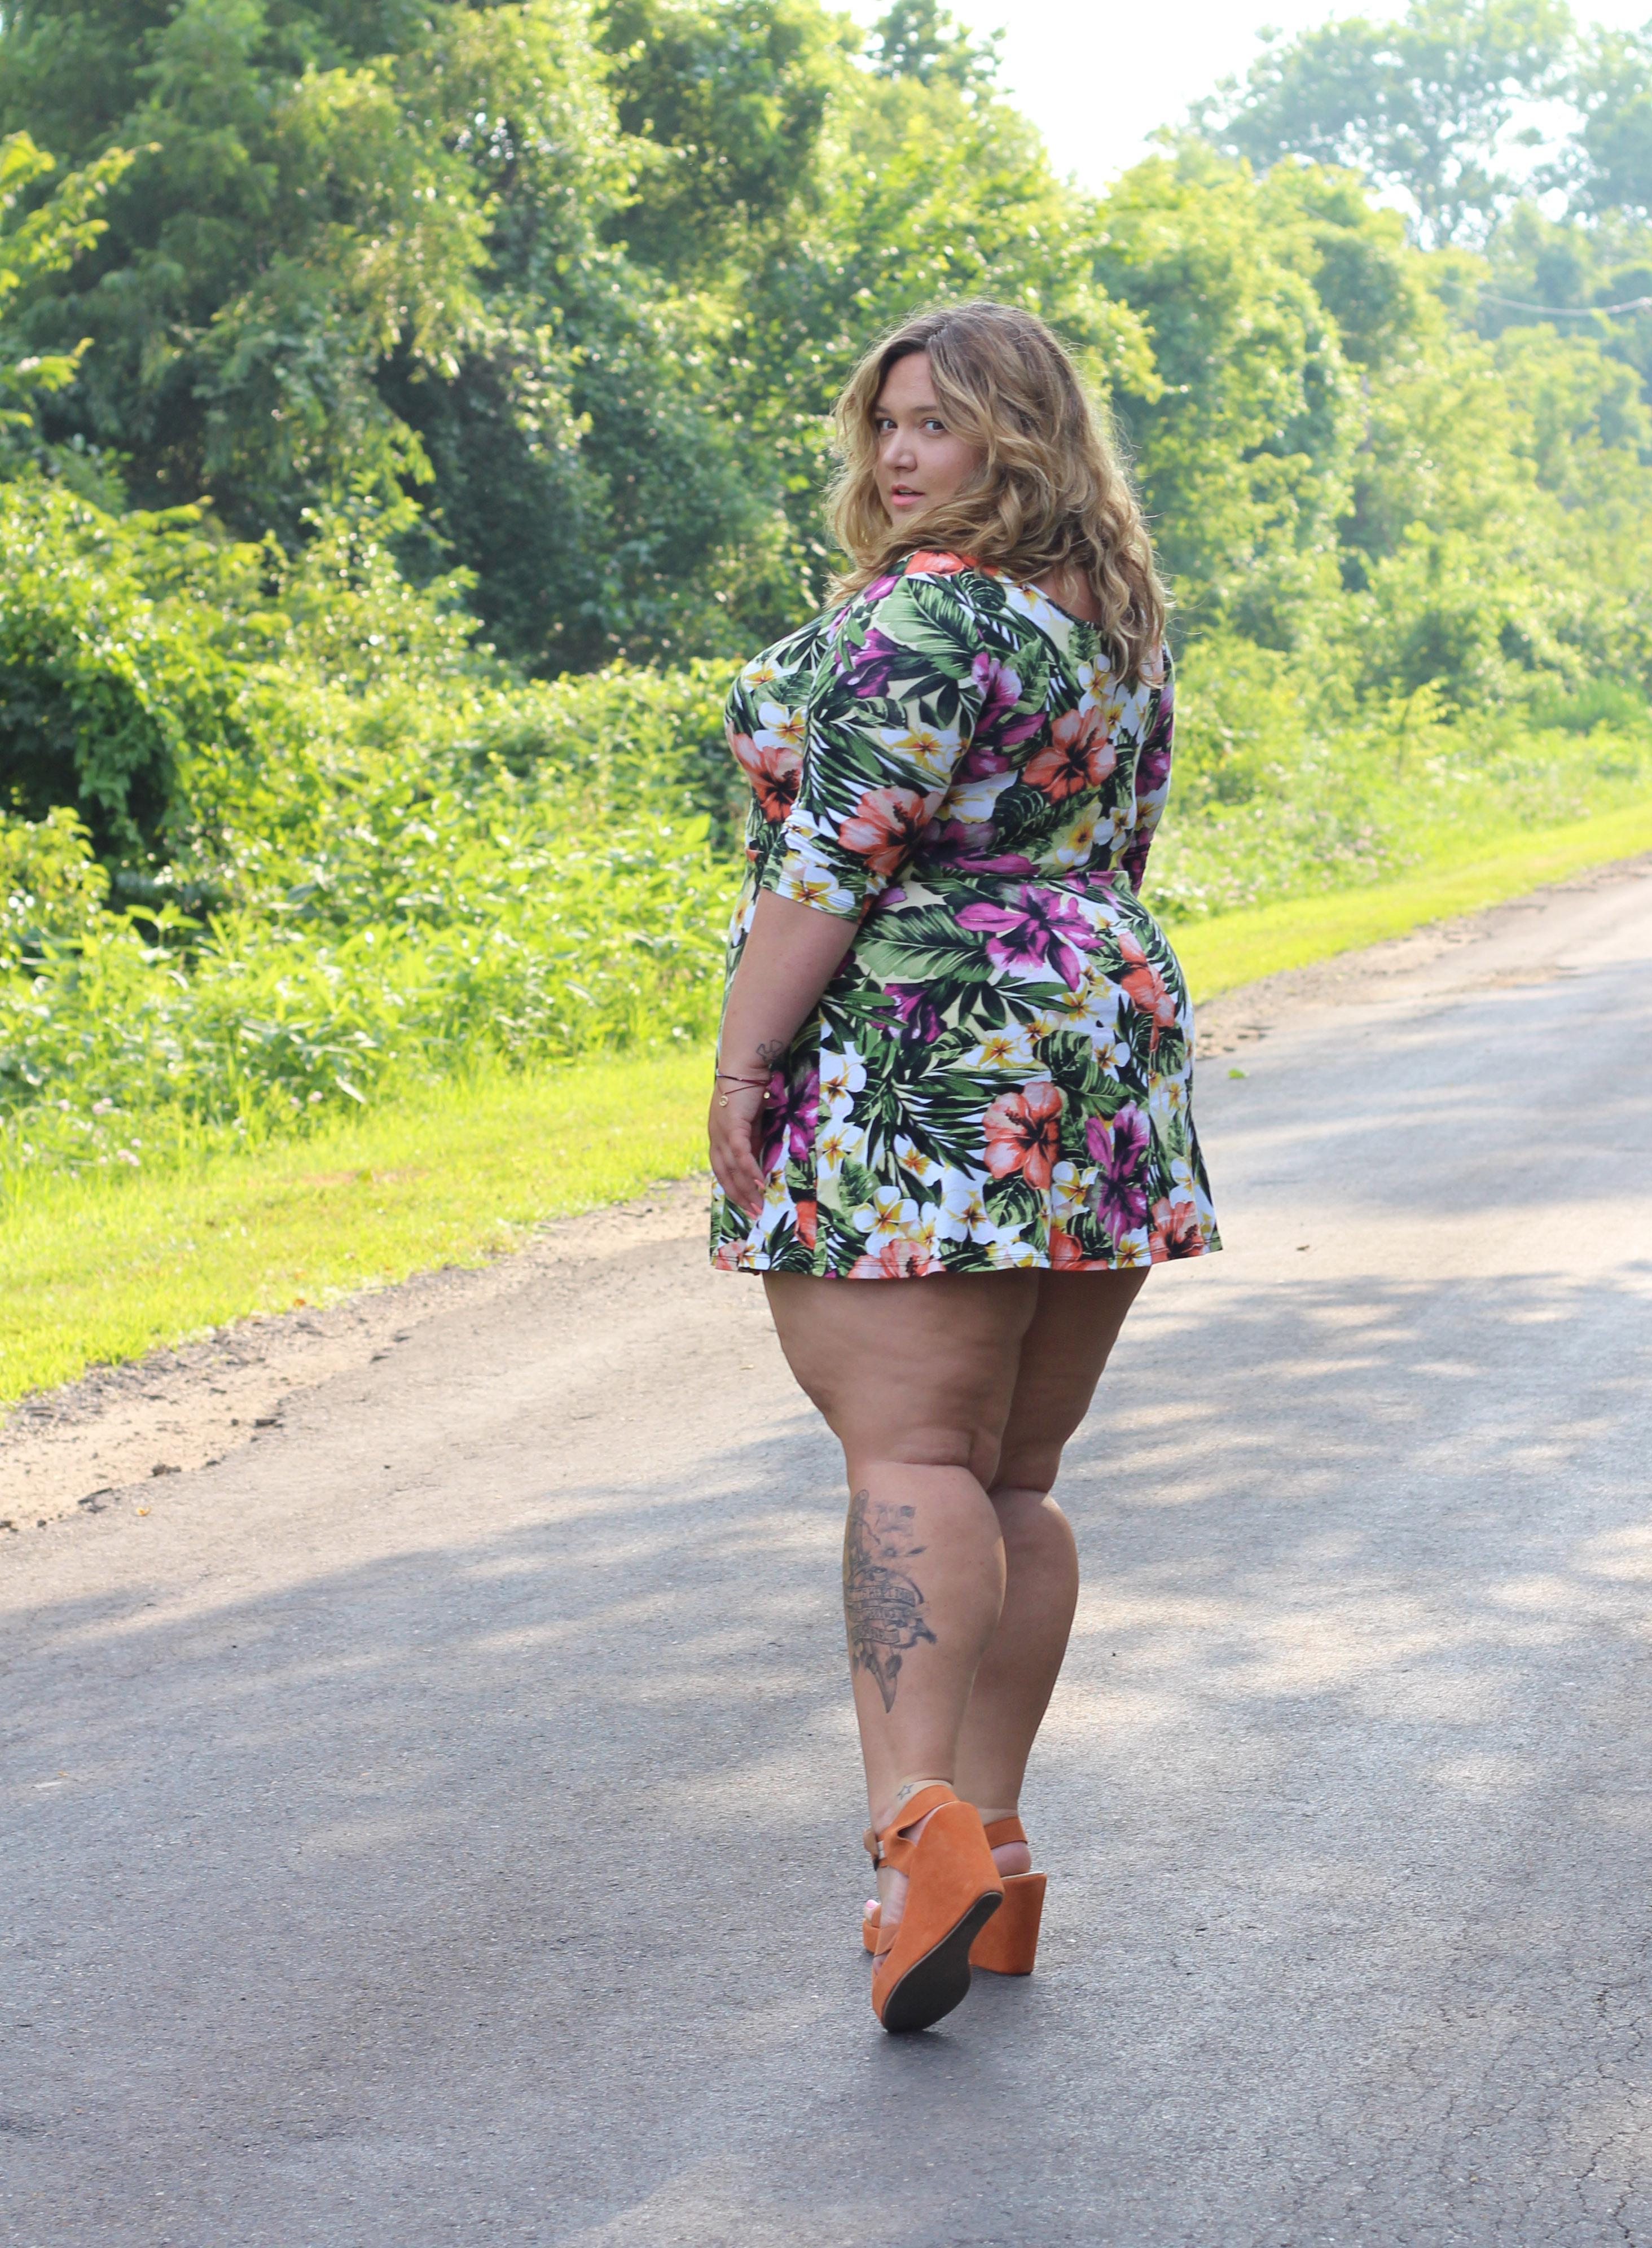 Hispanic Girl Wallpaper 4k Fat Girls Wallpapers High Quality Download Free